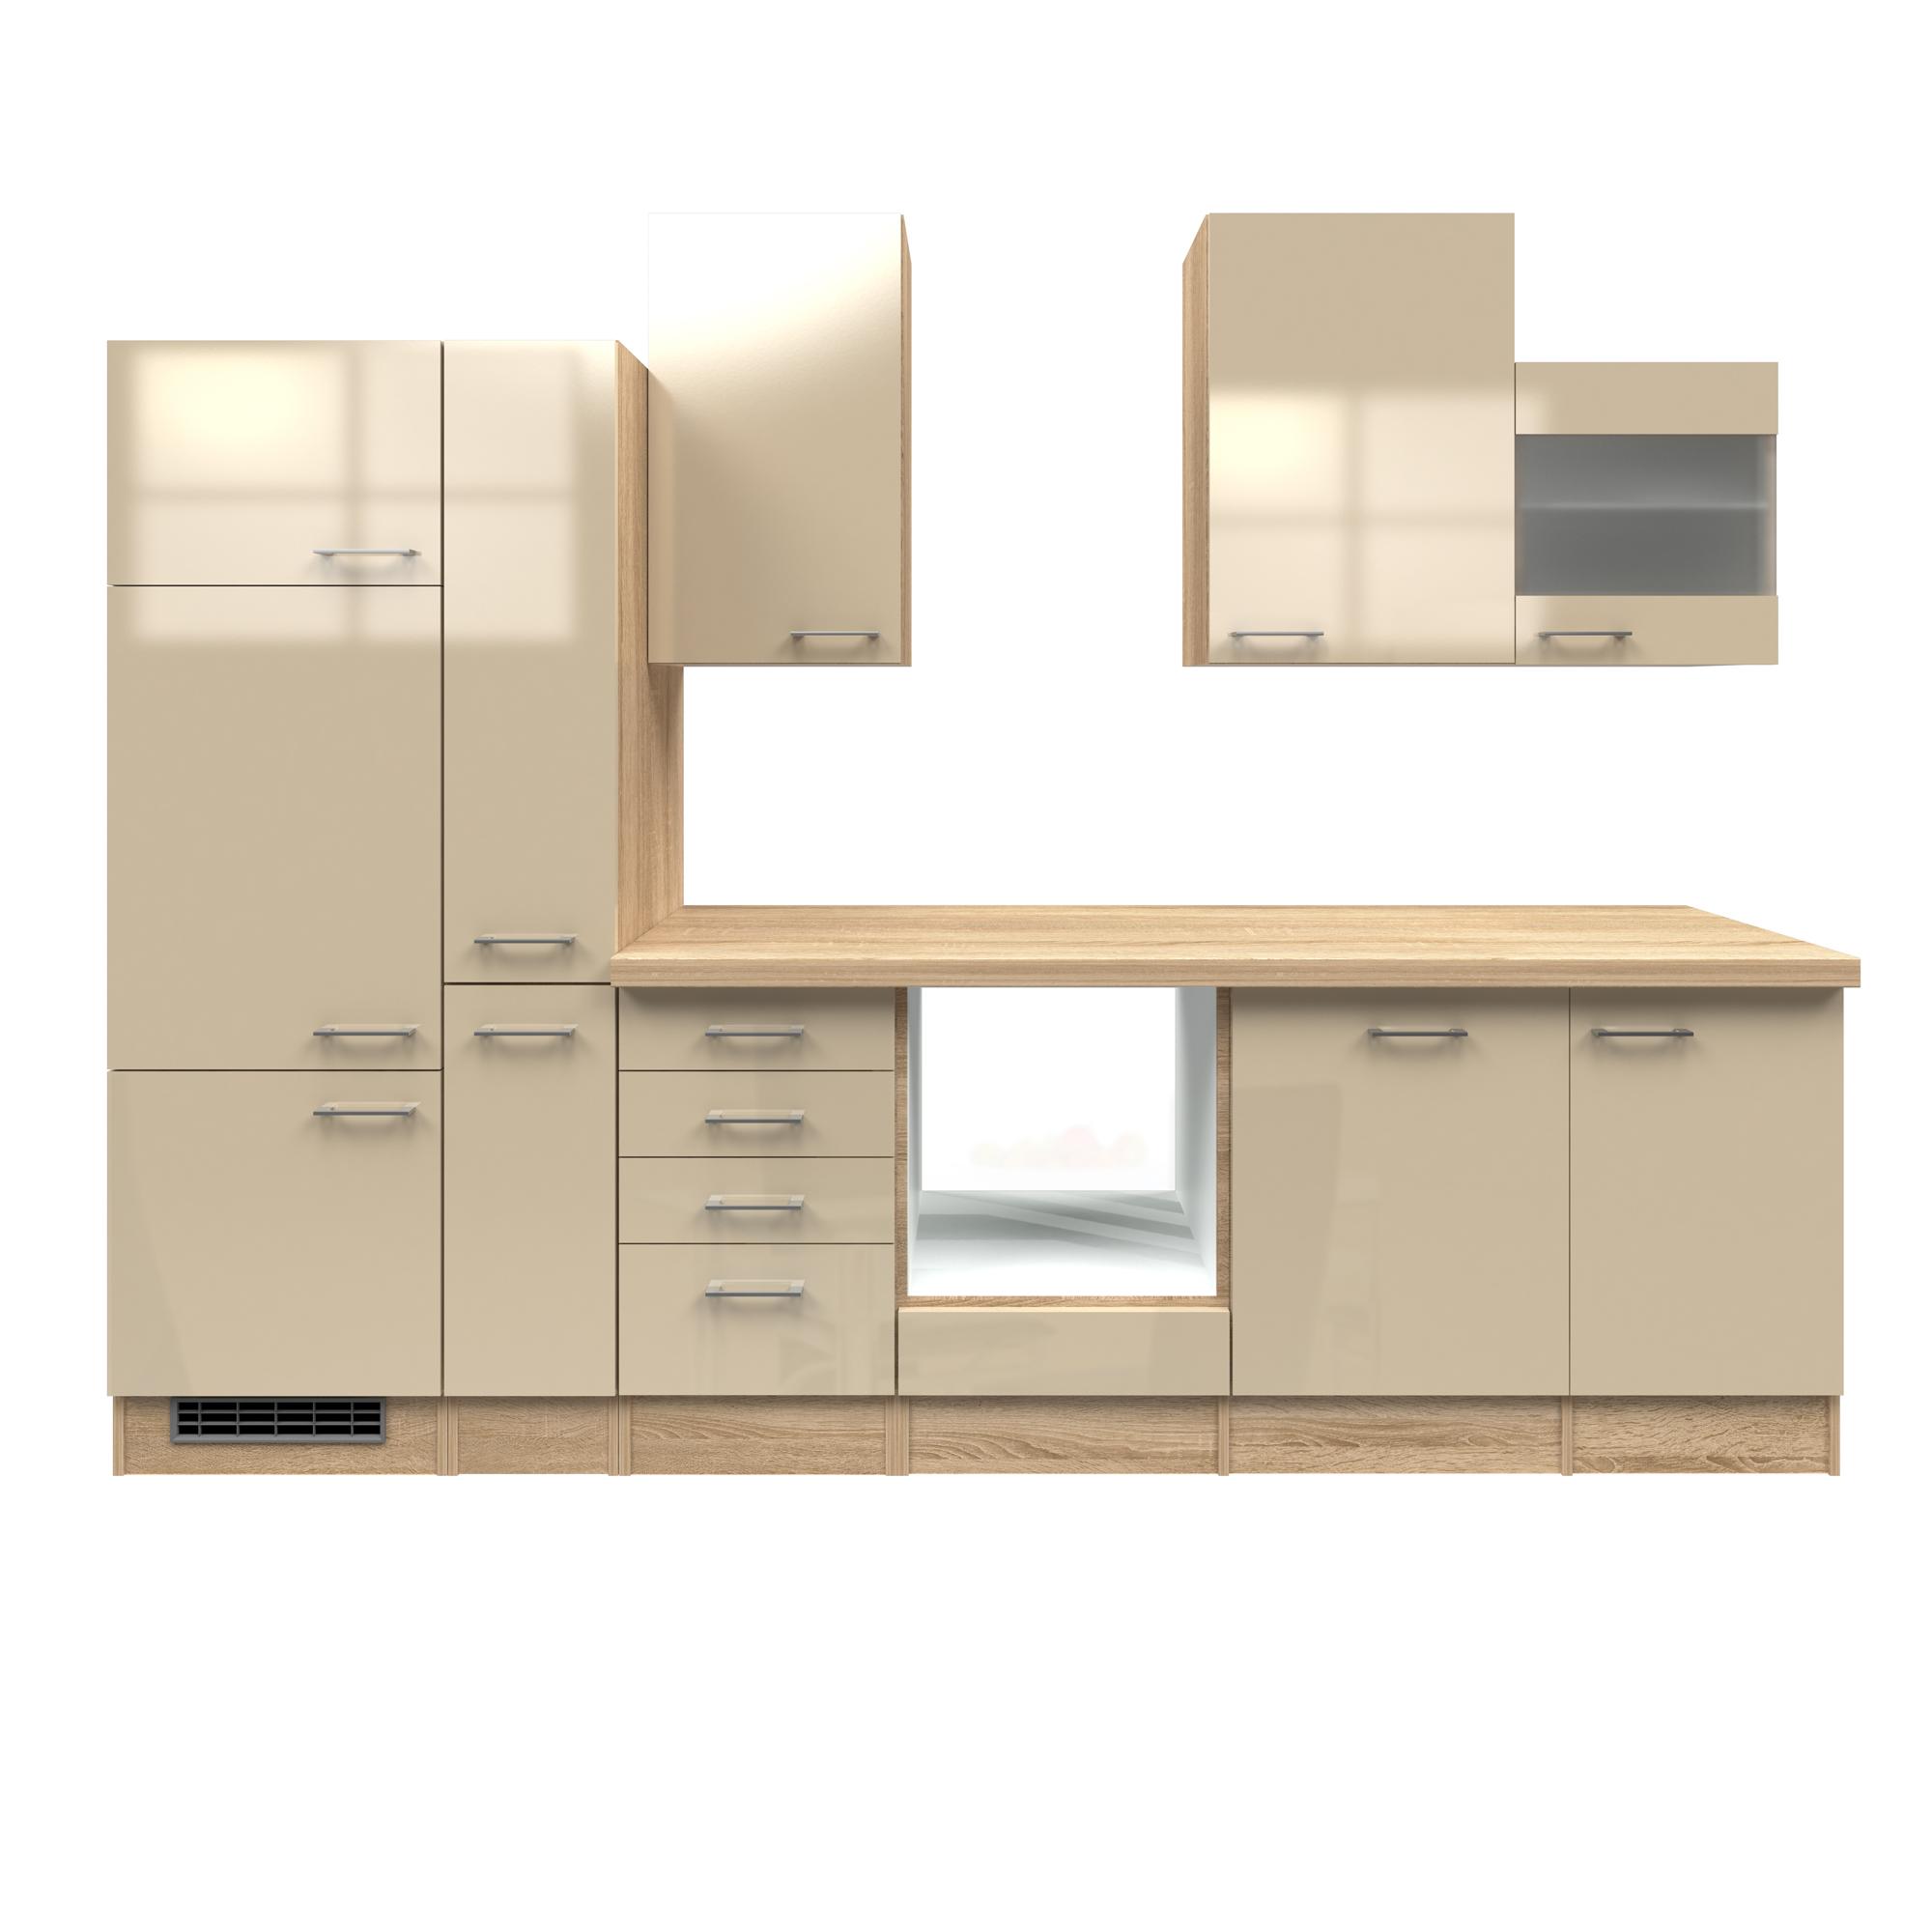 k che ohne e ger te k chenzeile einbauk che k chenblock 310 cm creme beige glanz ebay. Black Bedroom Furniture Sets. Home Design Ideas